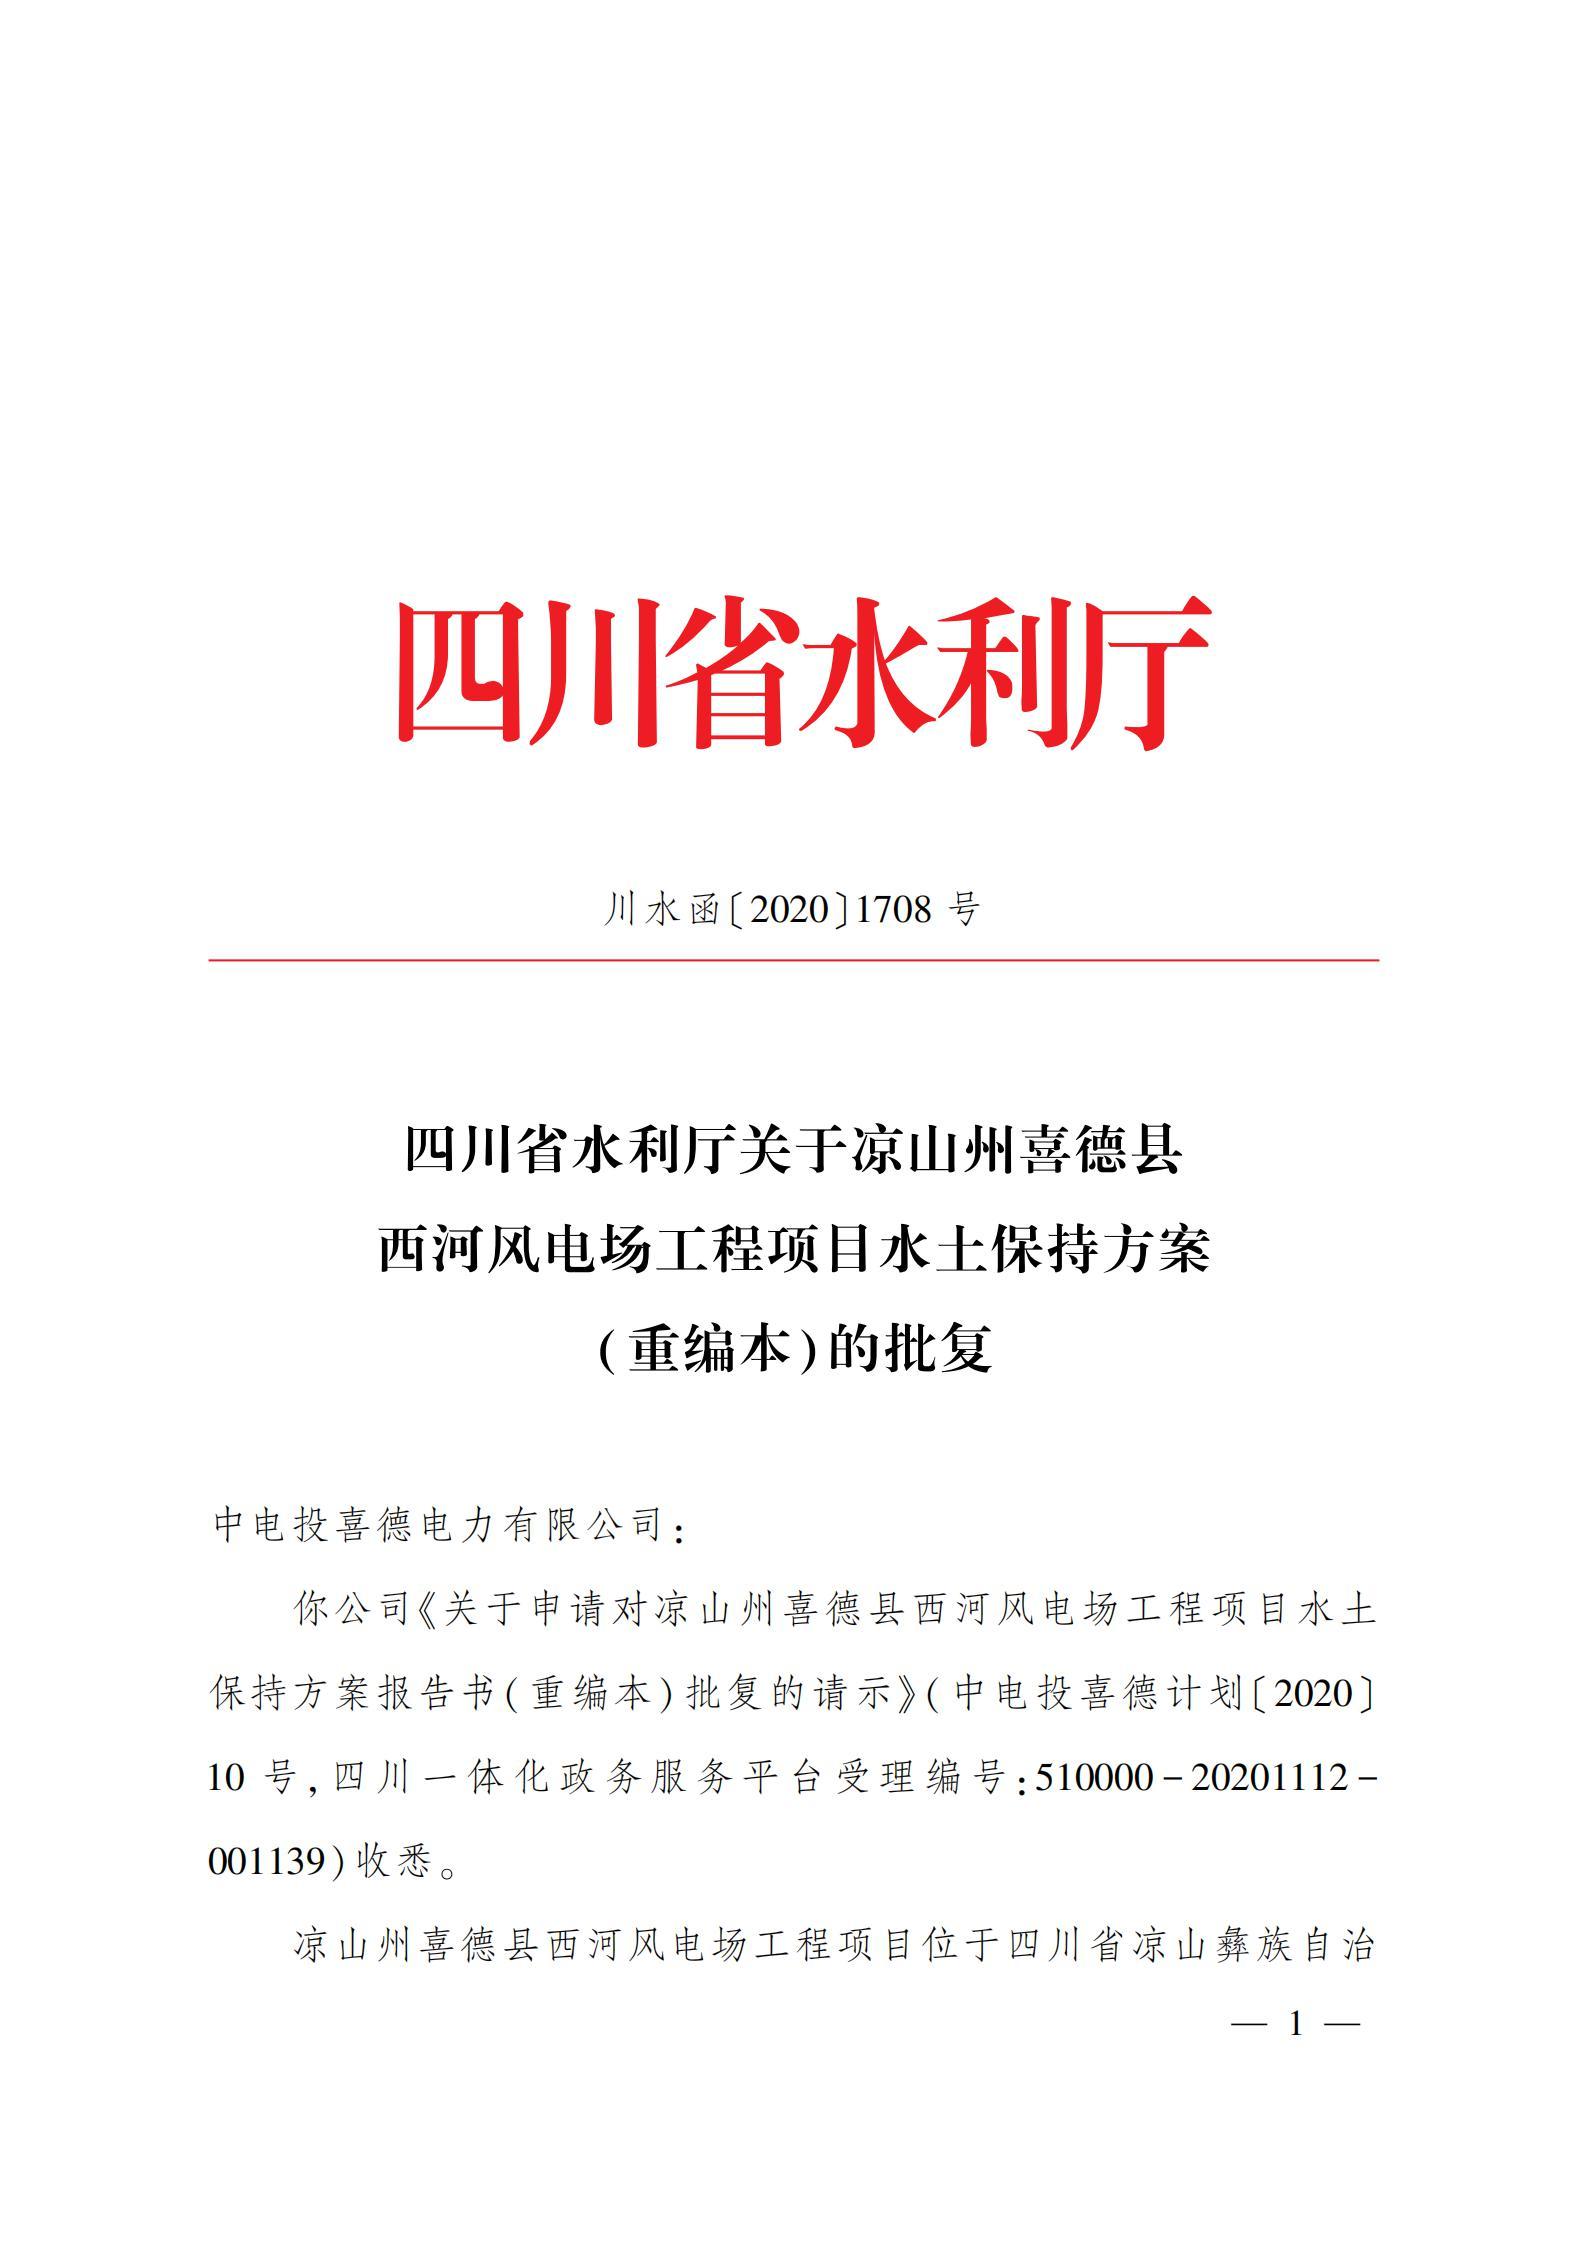 ZM2020-036 西河风电项目水土保持方案(重编本)-批复_00.jpg